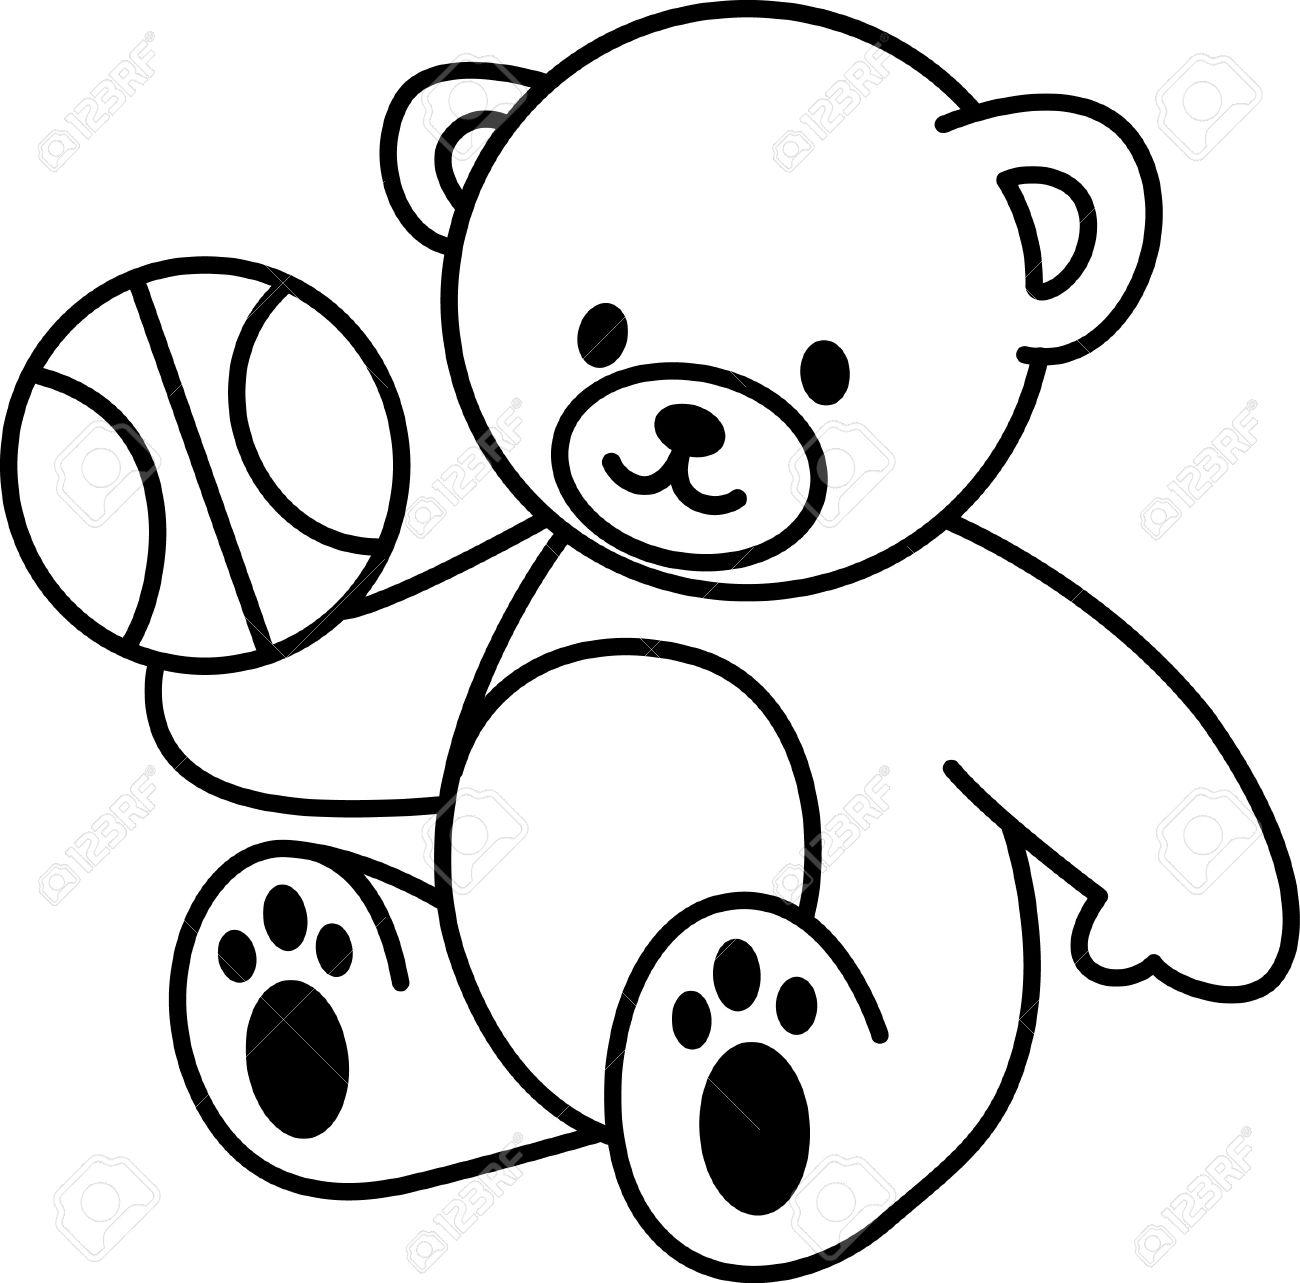 1300x1283 Illustration Of Very Cute Teddy Bear Basketbal Royalty